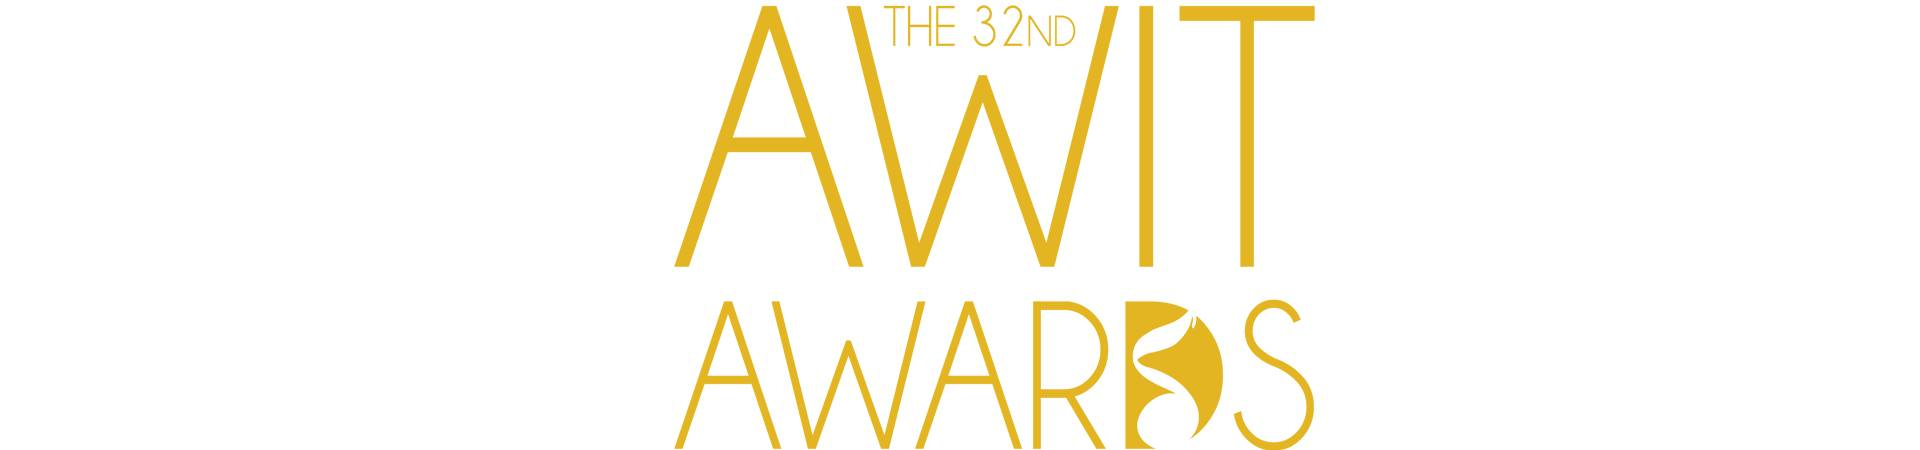 32nd Awit Awards Favorite New Female Artist